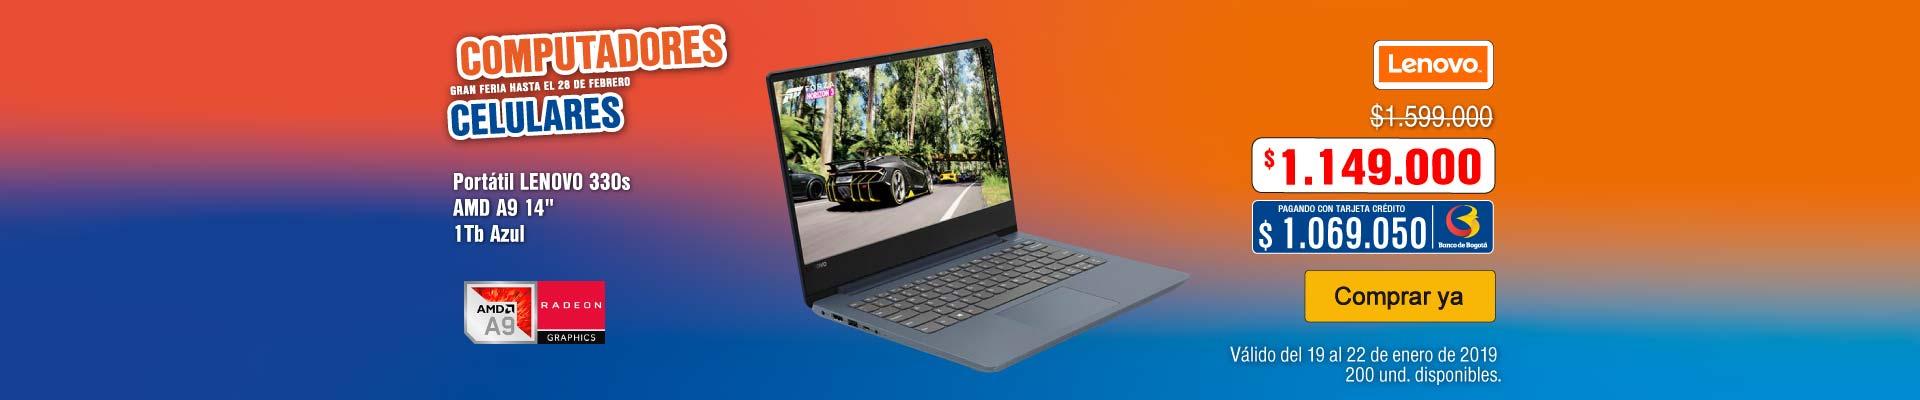 AK-PPAL-2-computadores y tablets-PP---Lenovo-Portátil 330s AMD A9-ene19